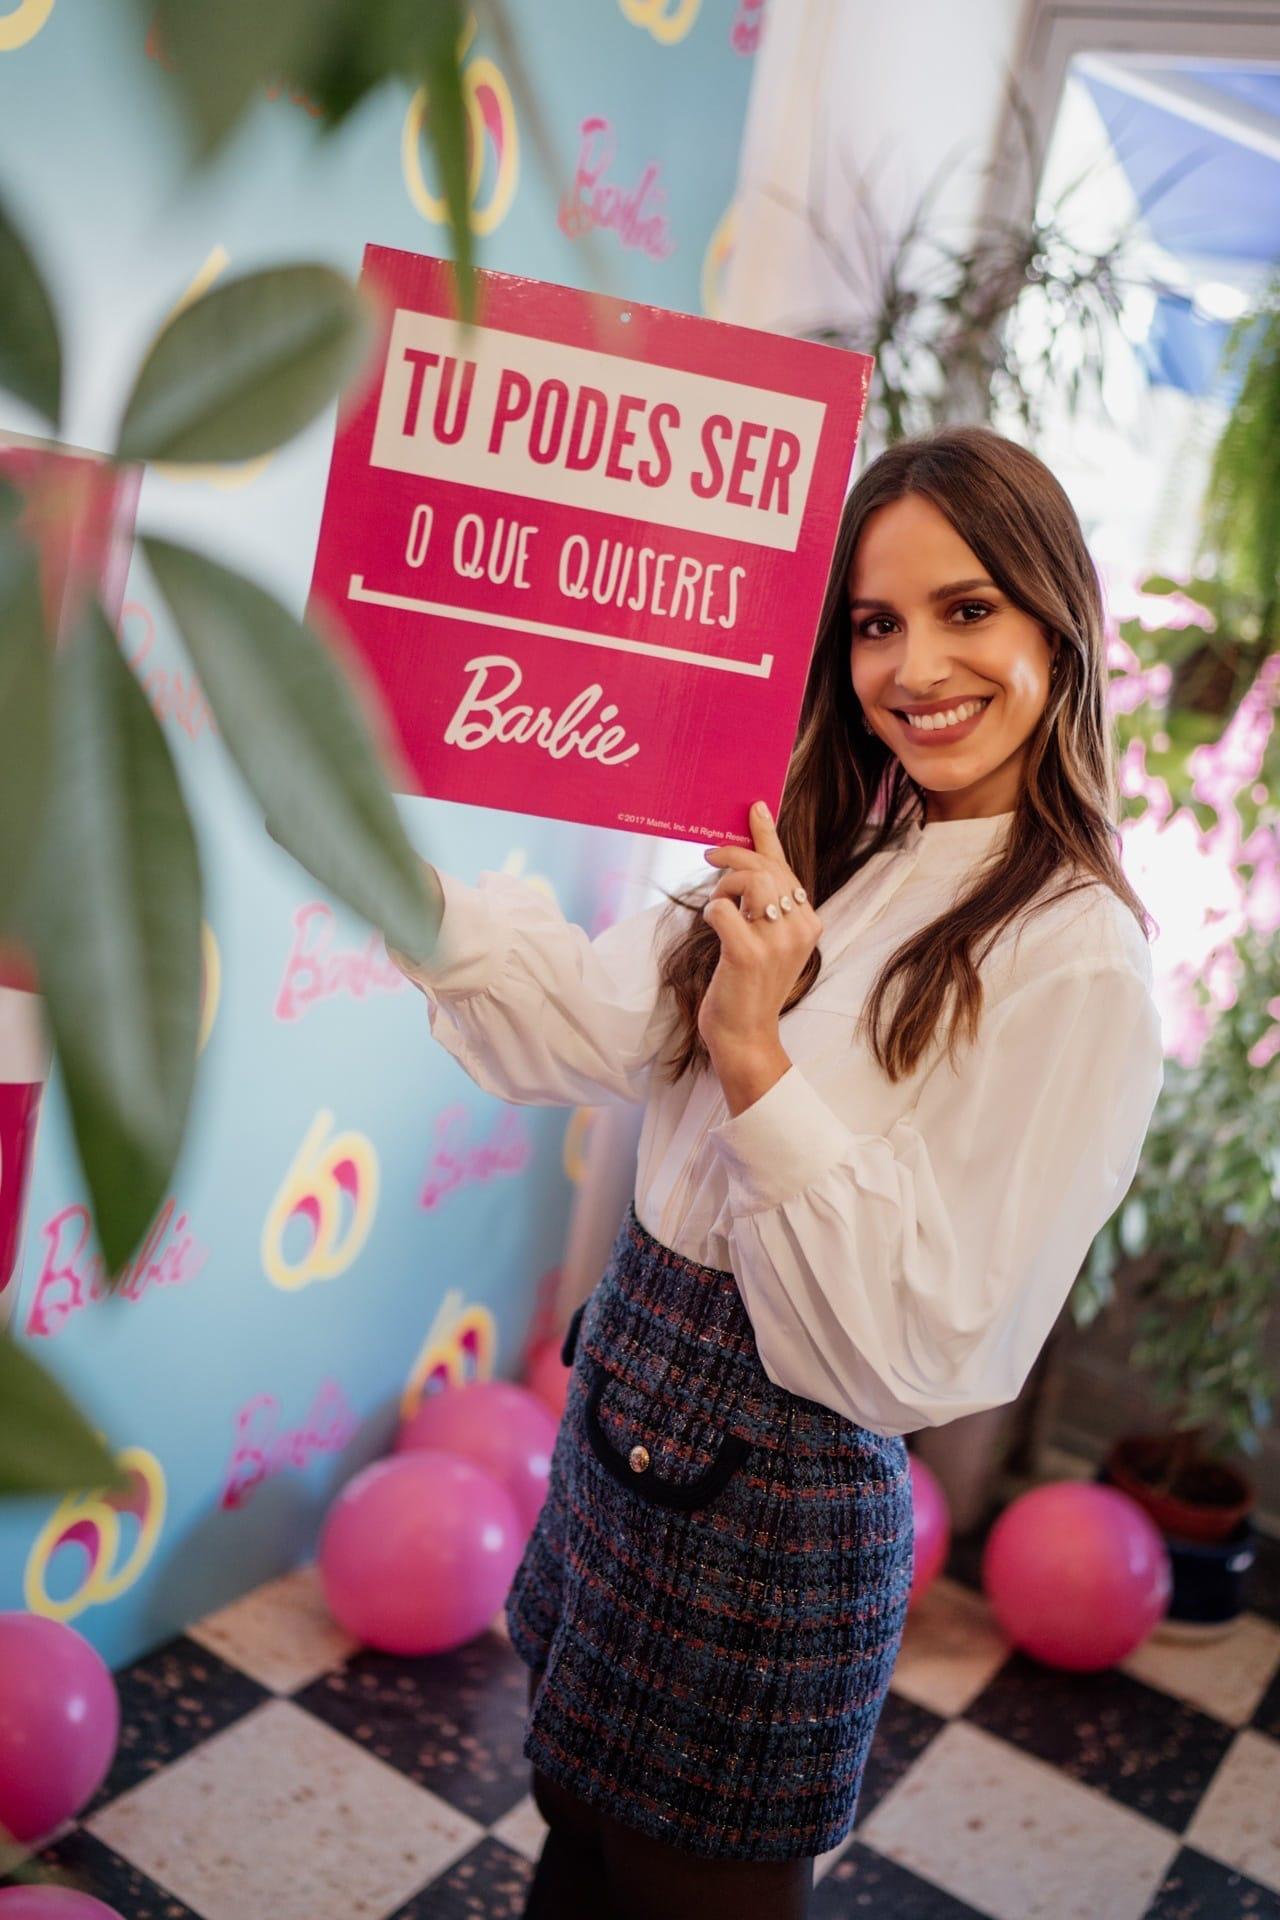 "Embaixadora ""Tu podes ser o que quiseres"" / Barbie"